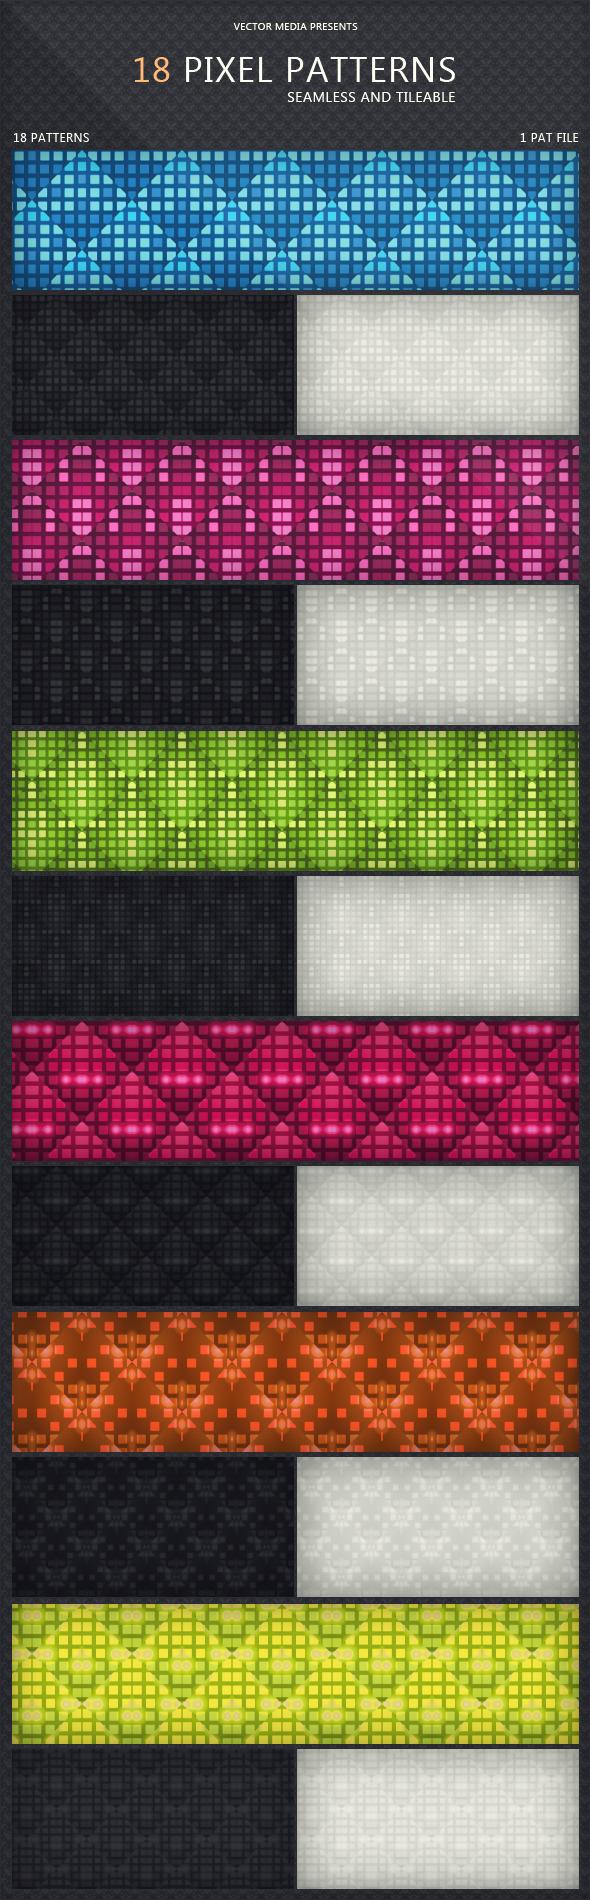 18 Pixel Patterns - Techno / Futuristic Textures / Fills / Patterns